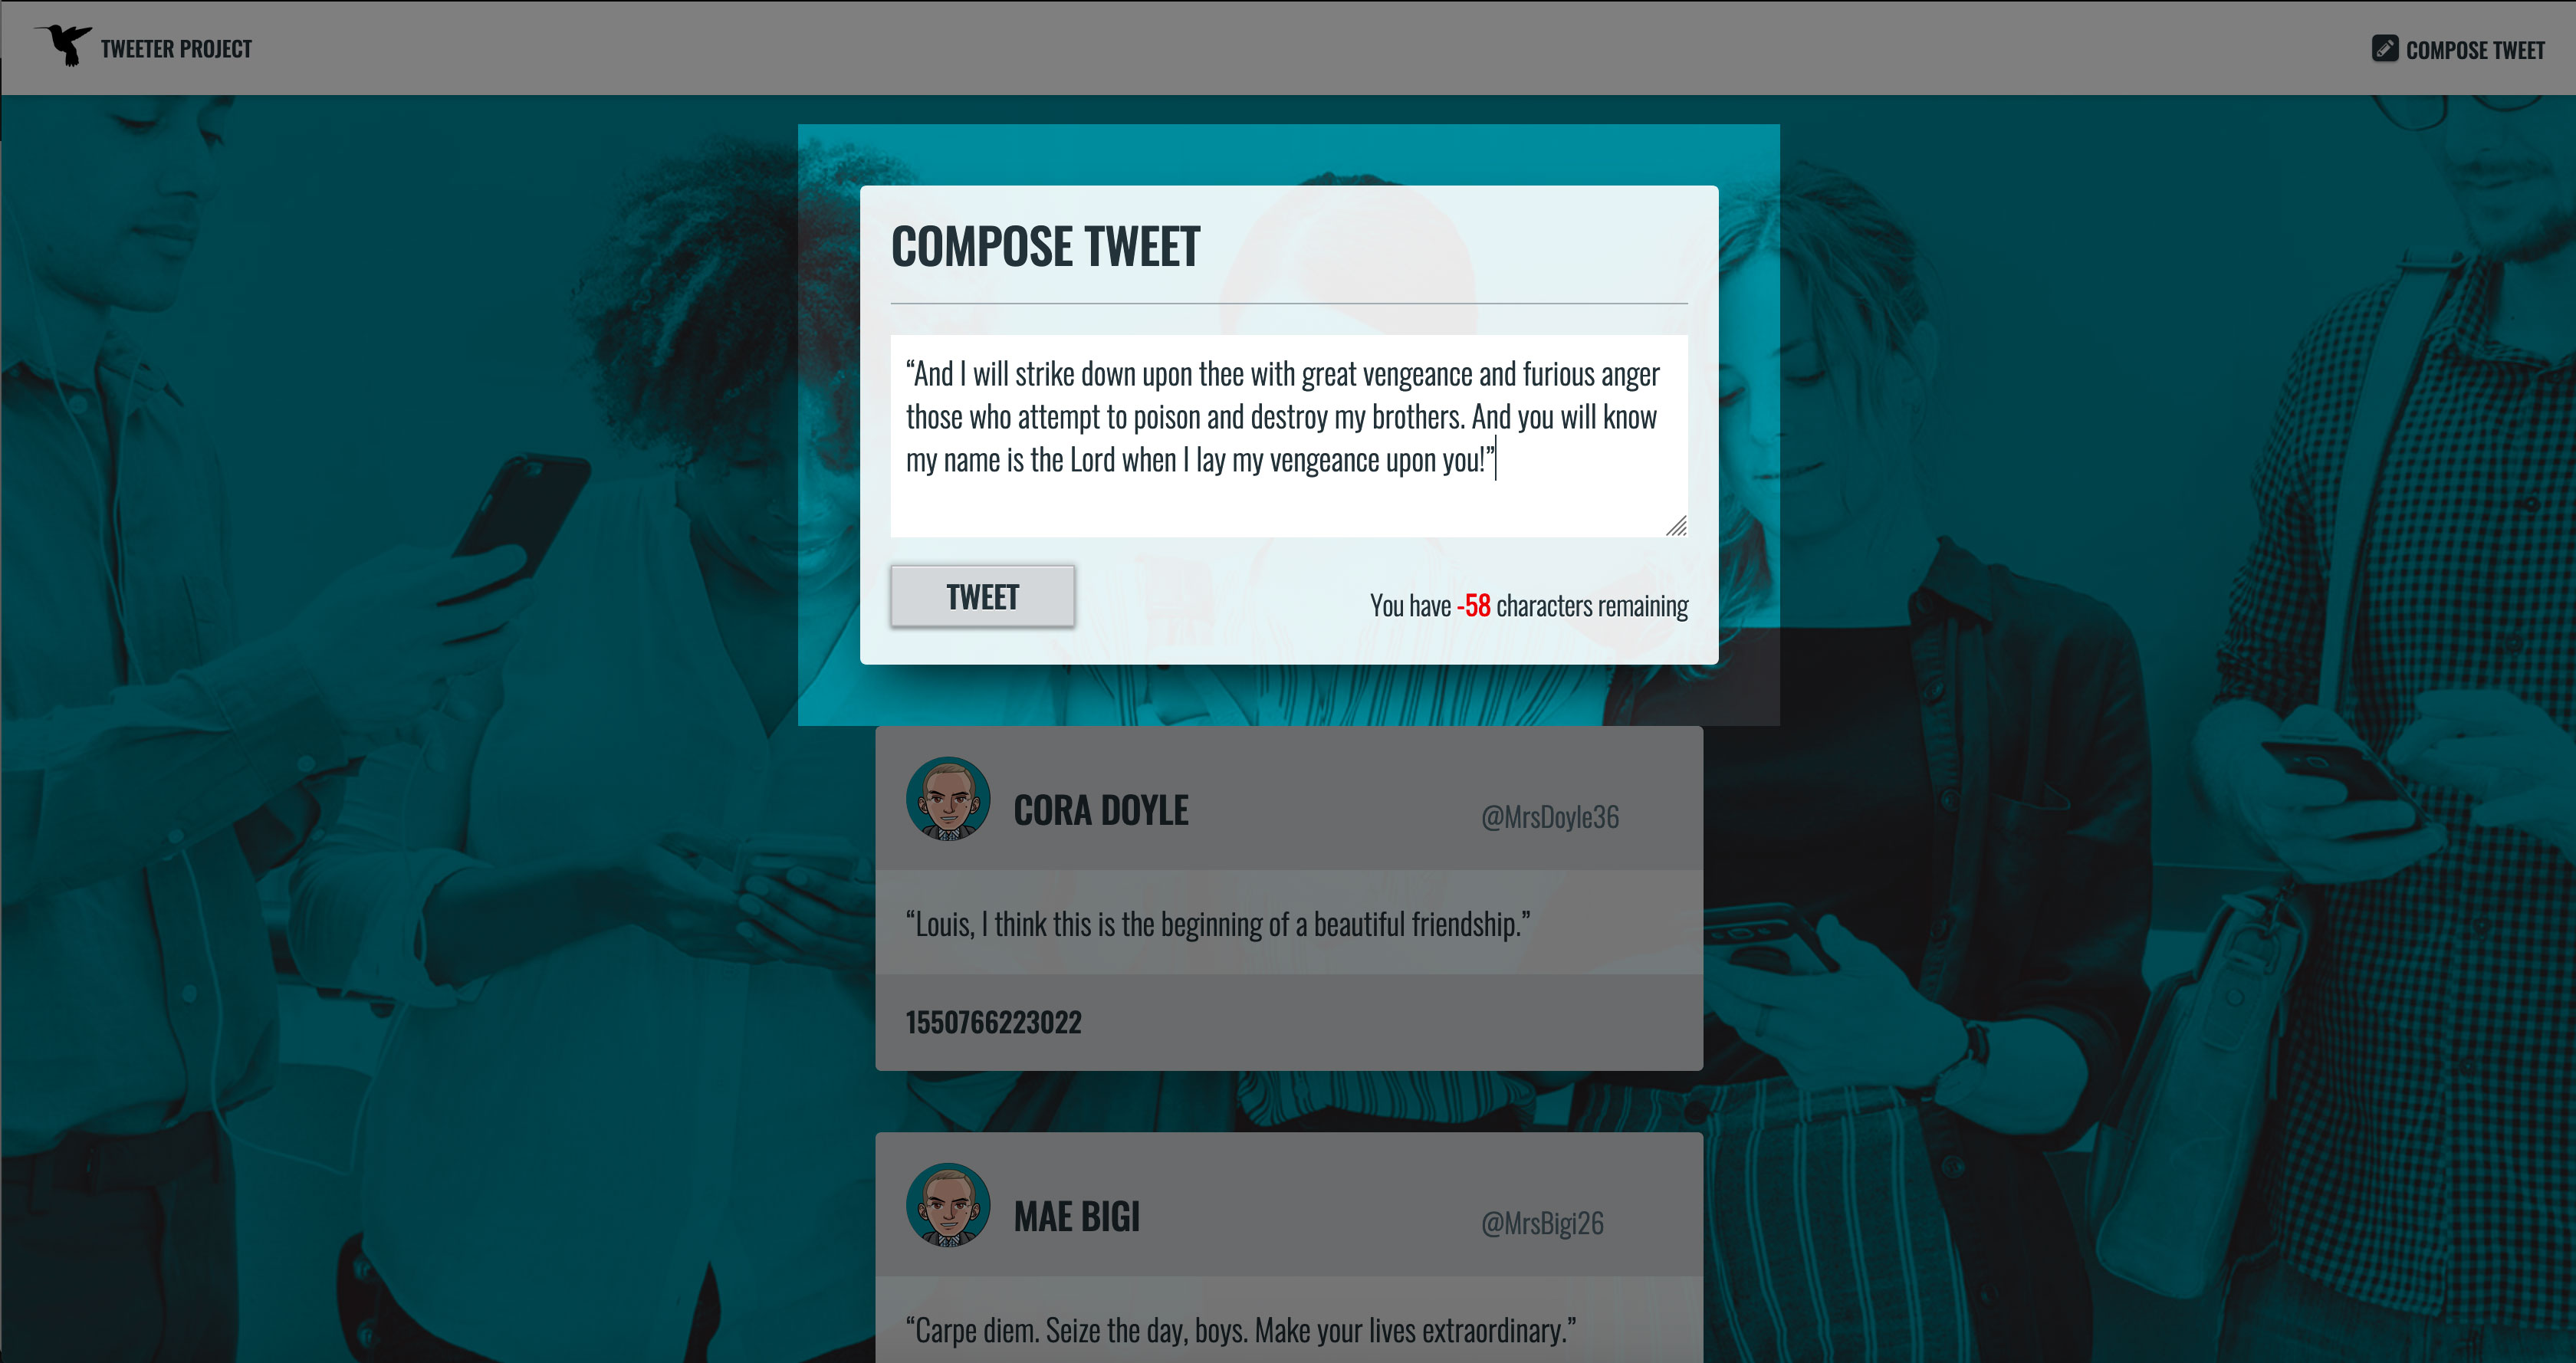 New Tweet, Web Form: Error Message, Content too Long